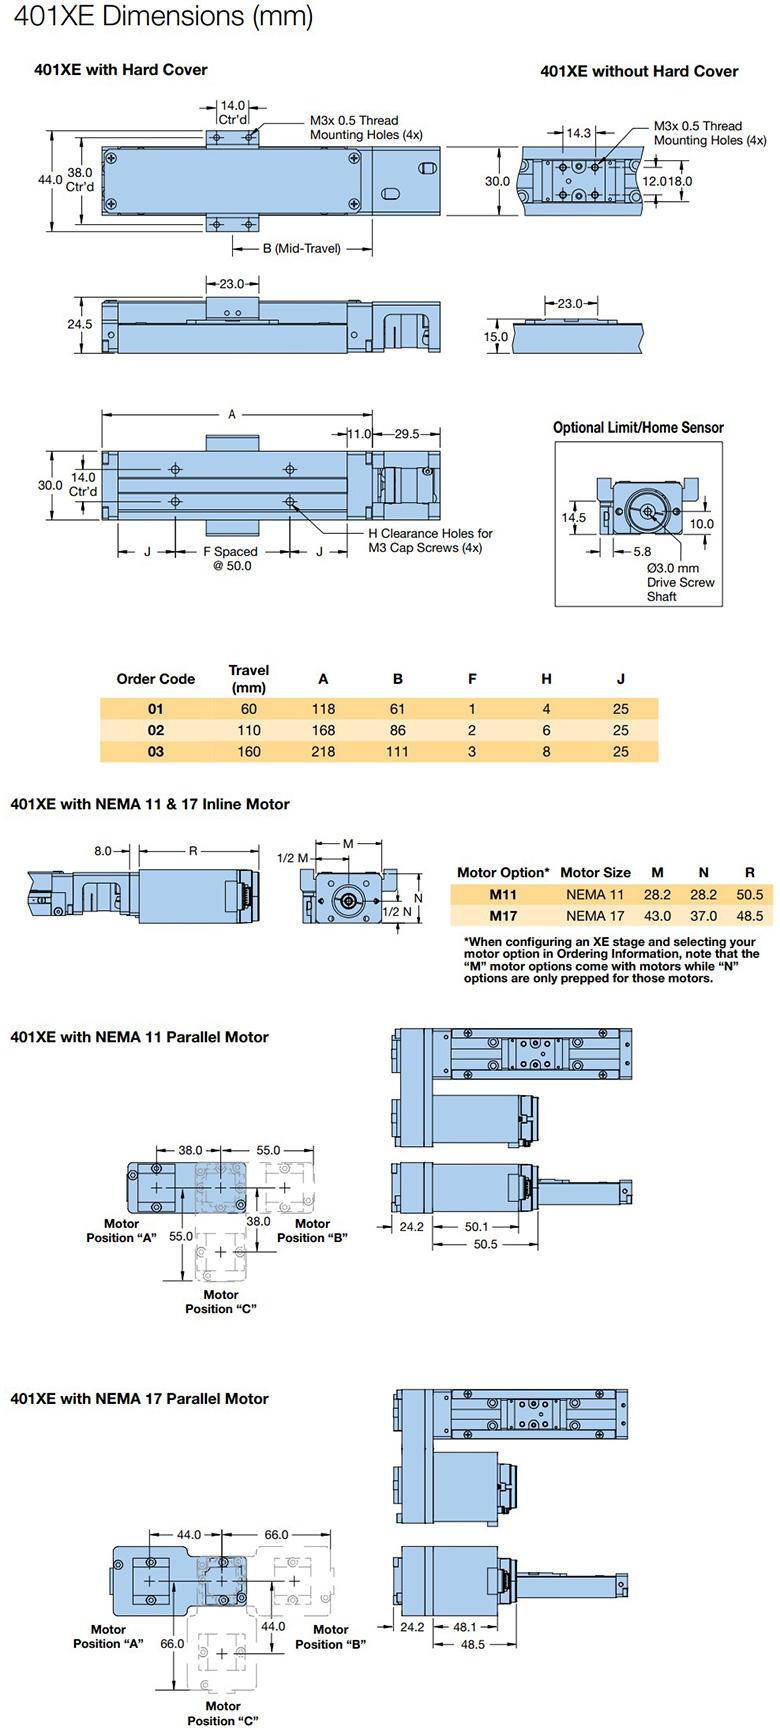 parker 401xe series dimensions